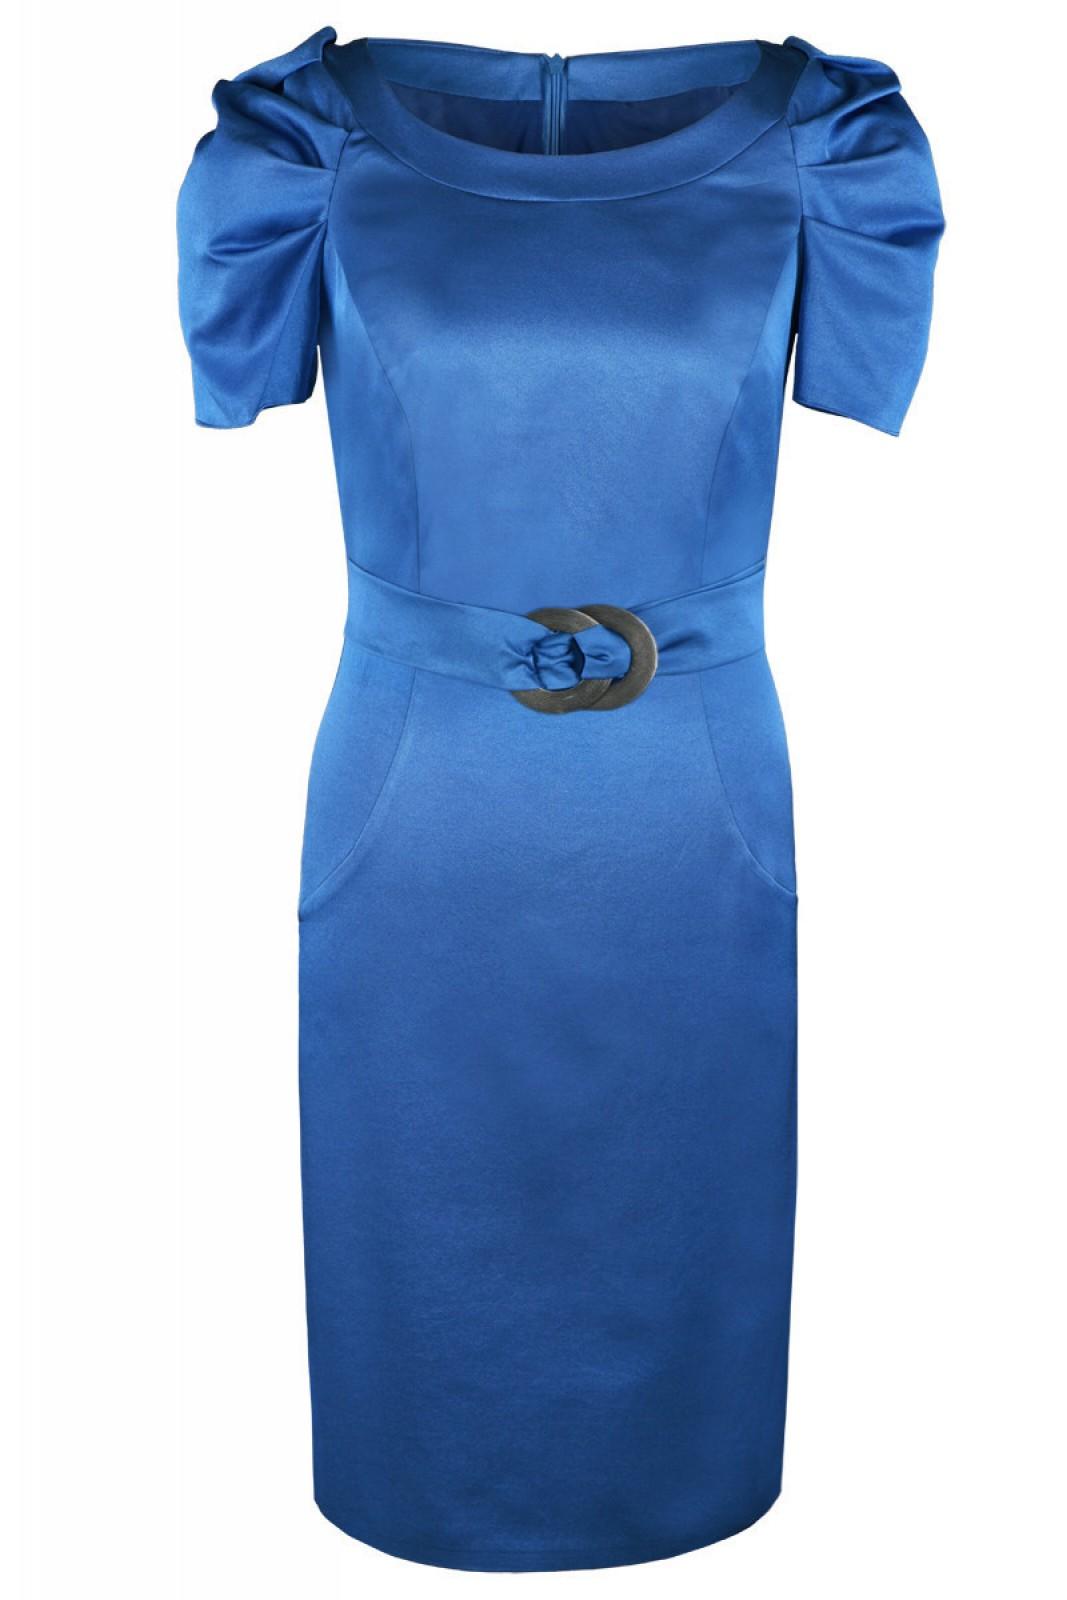 Blaues kleid puffarmel